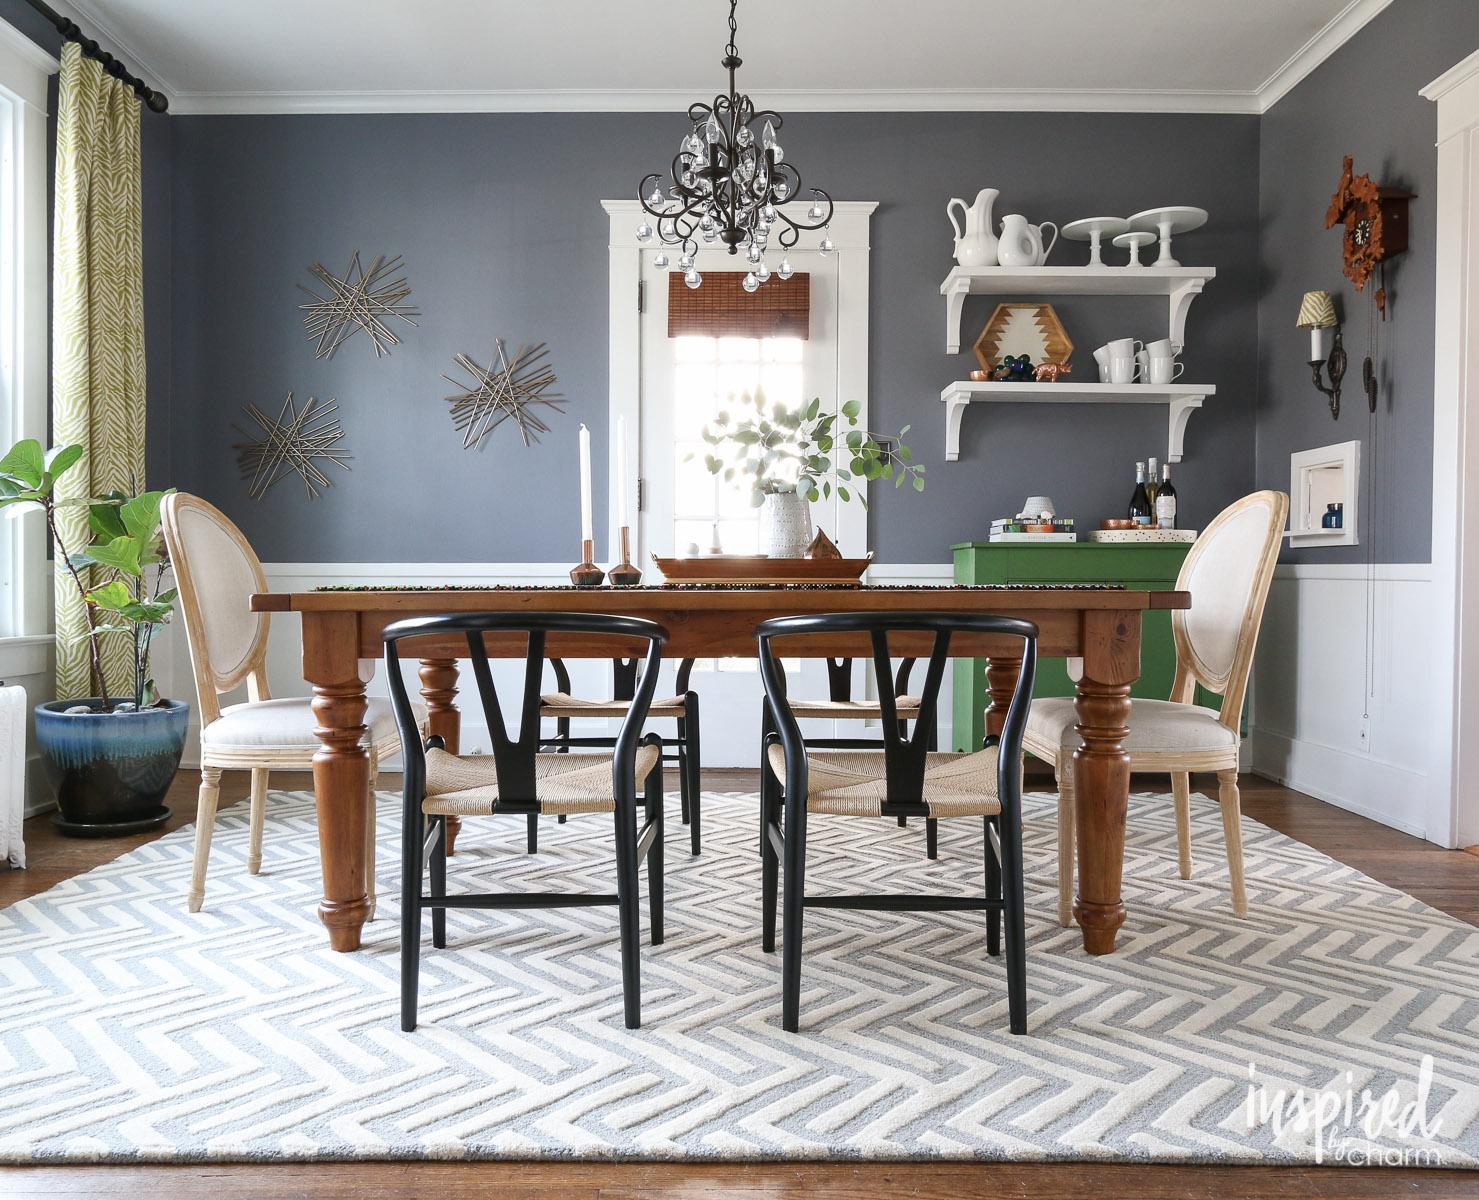 rugs for dining room download image HFHORVN